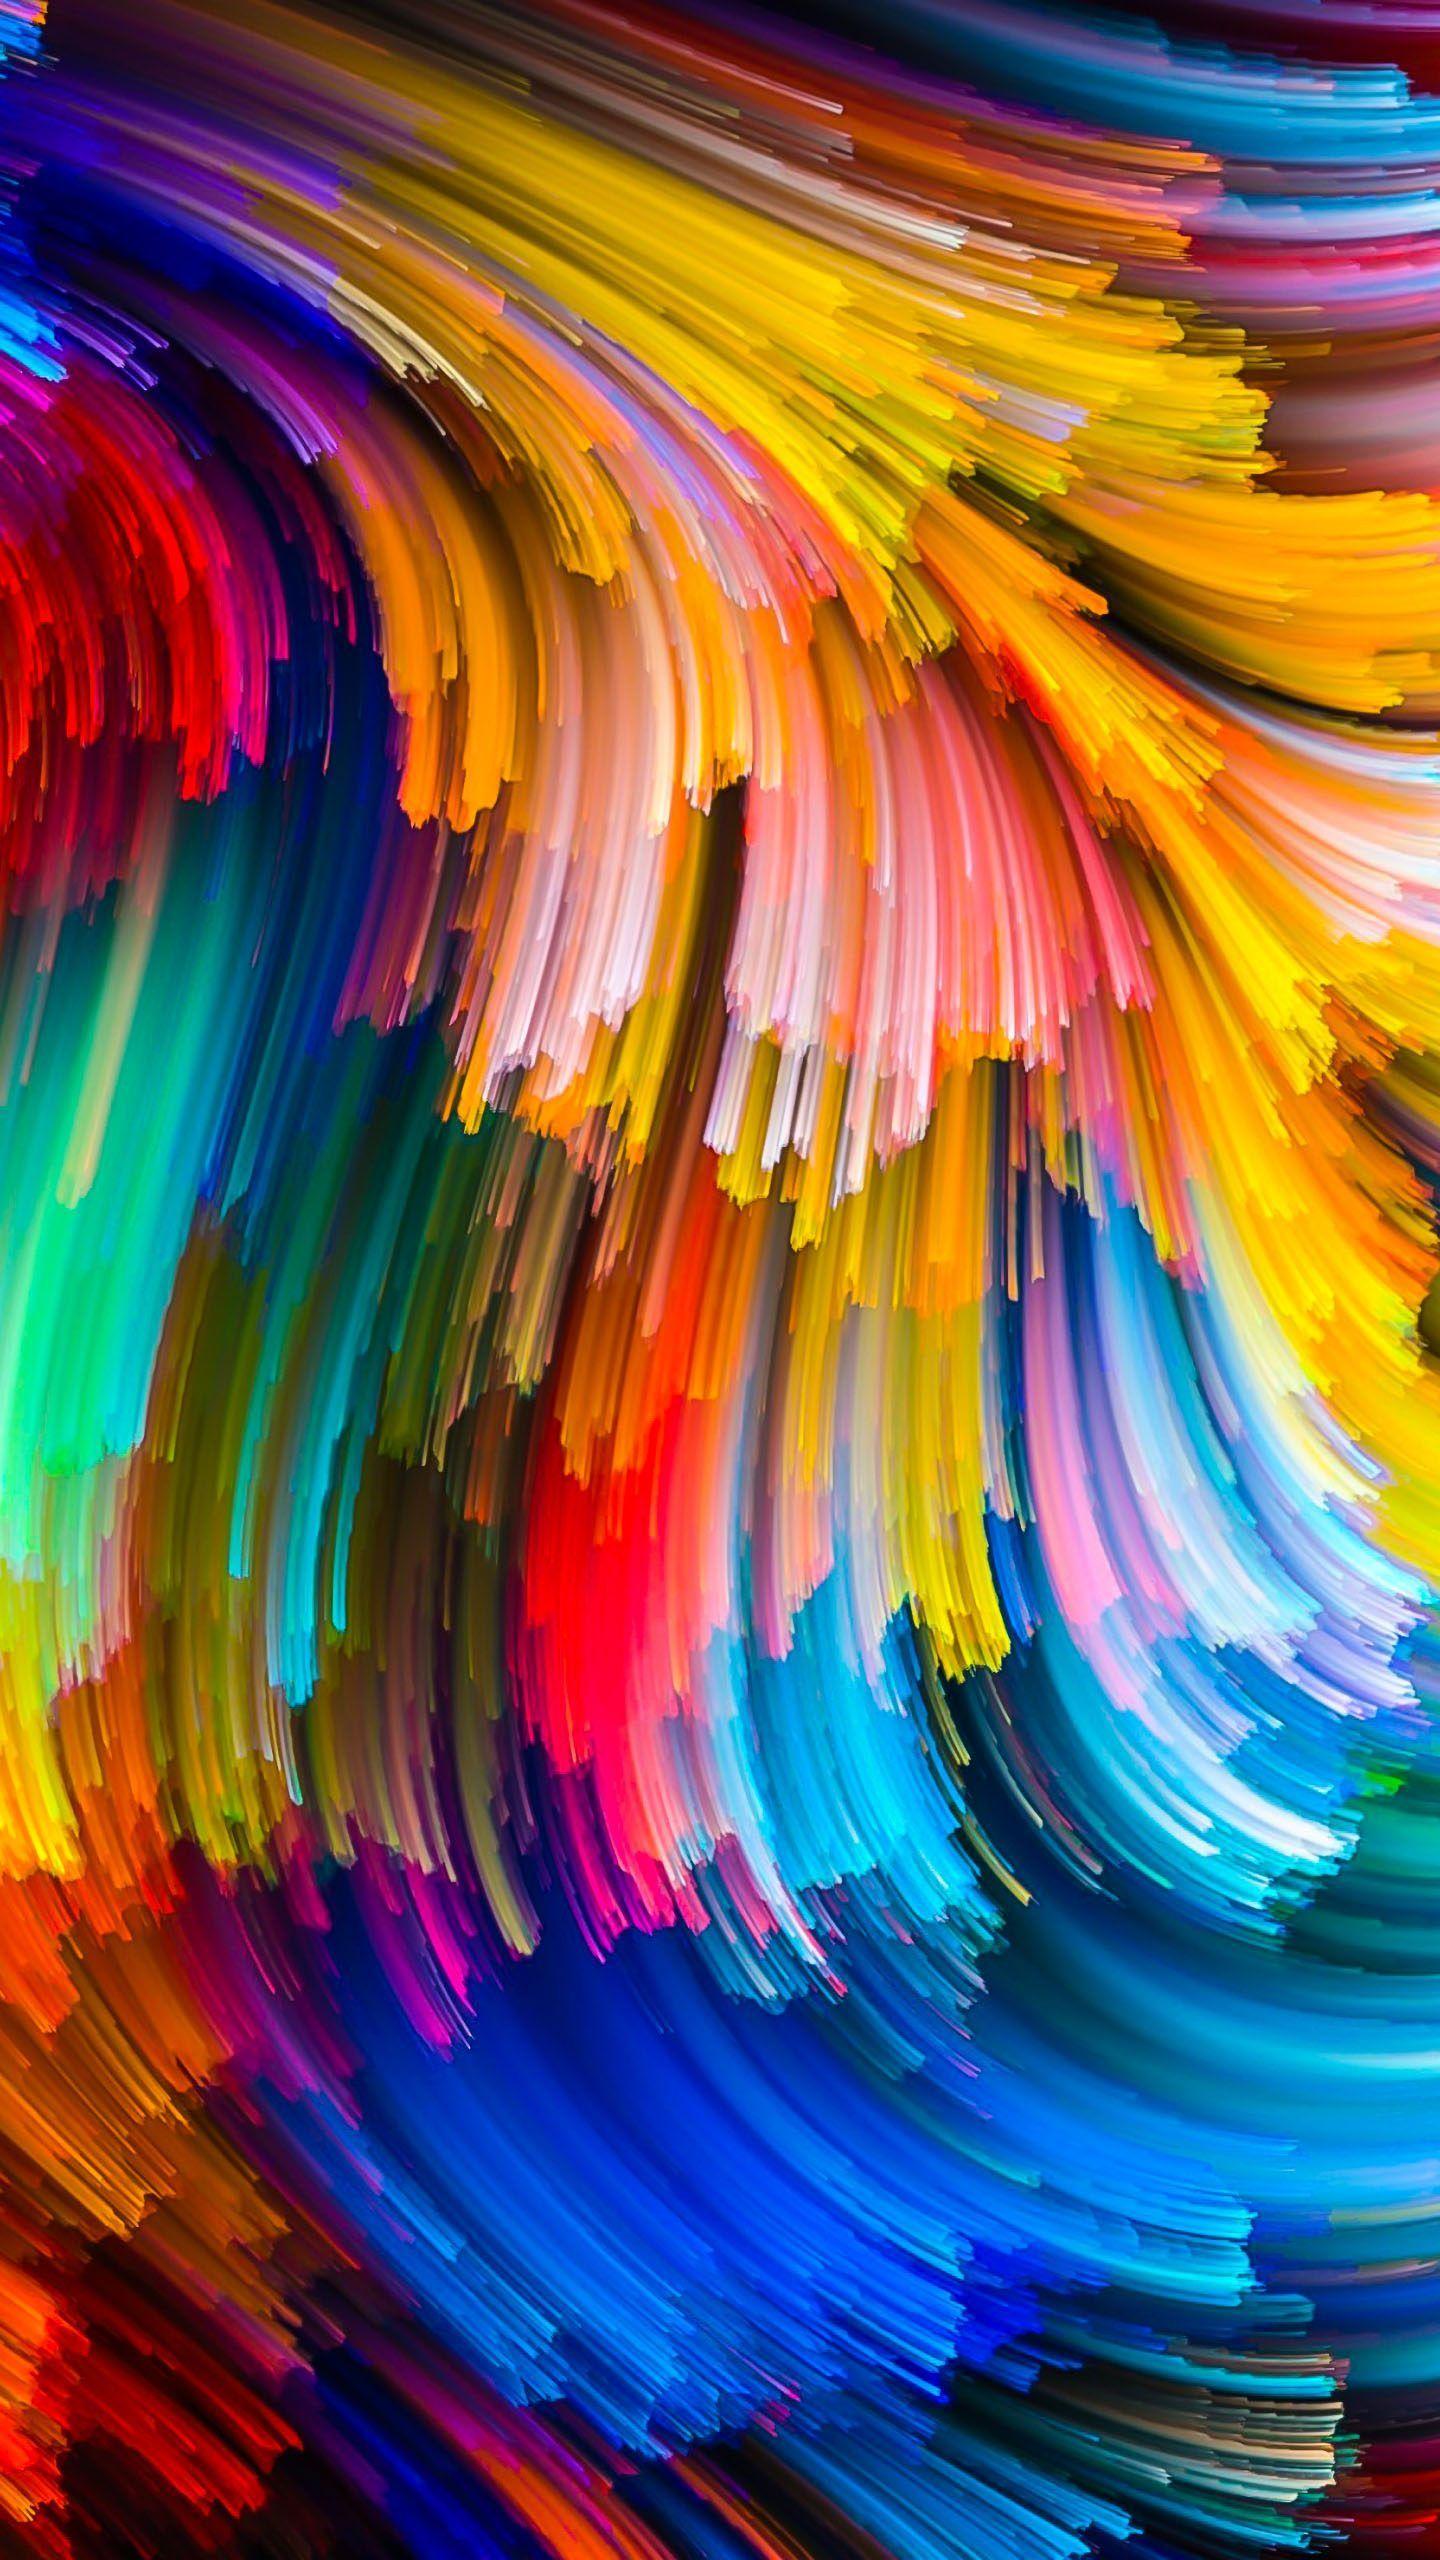 Abstract Pattern Wallpaper 4k Allwallpaper In 2020 4k Phone Wallpapers Abstract Colorful Wallpaper